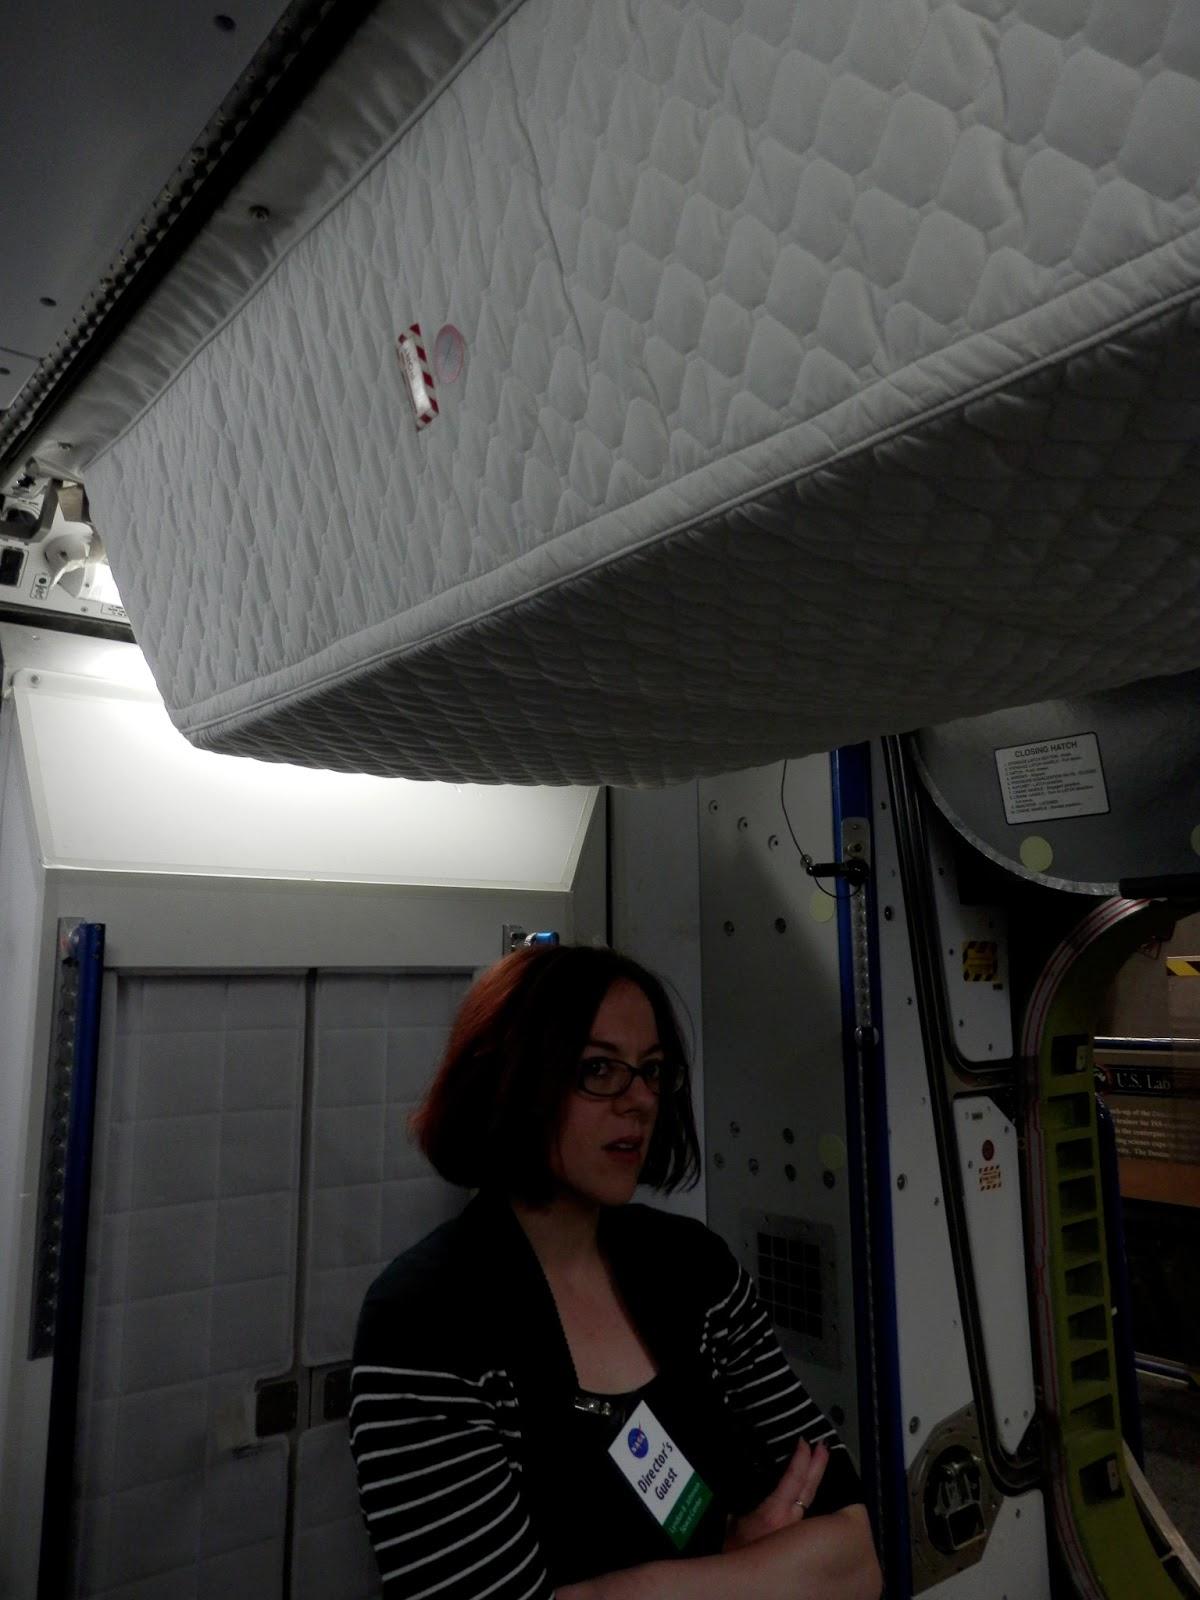 astronauts sleeping compartment - photo #41